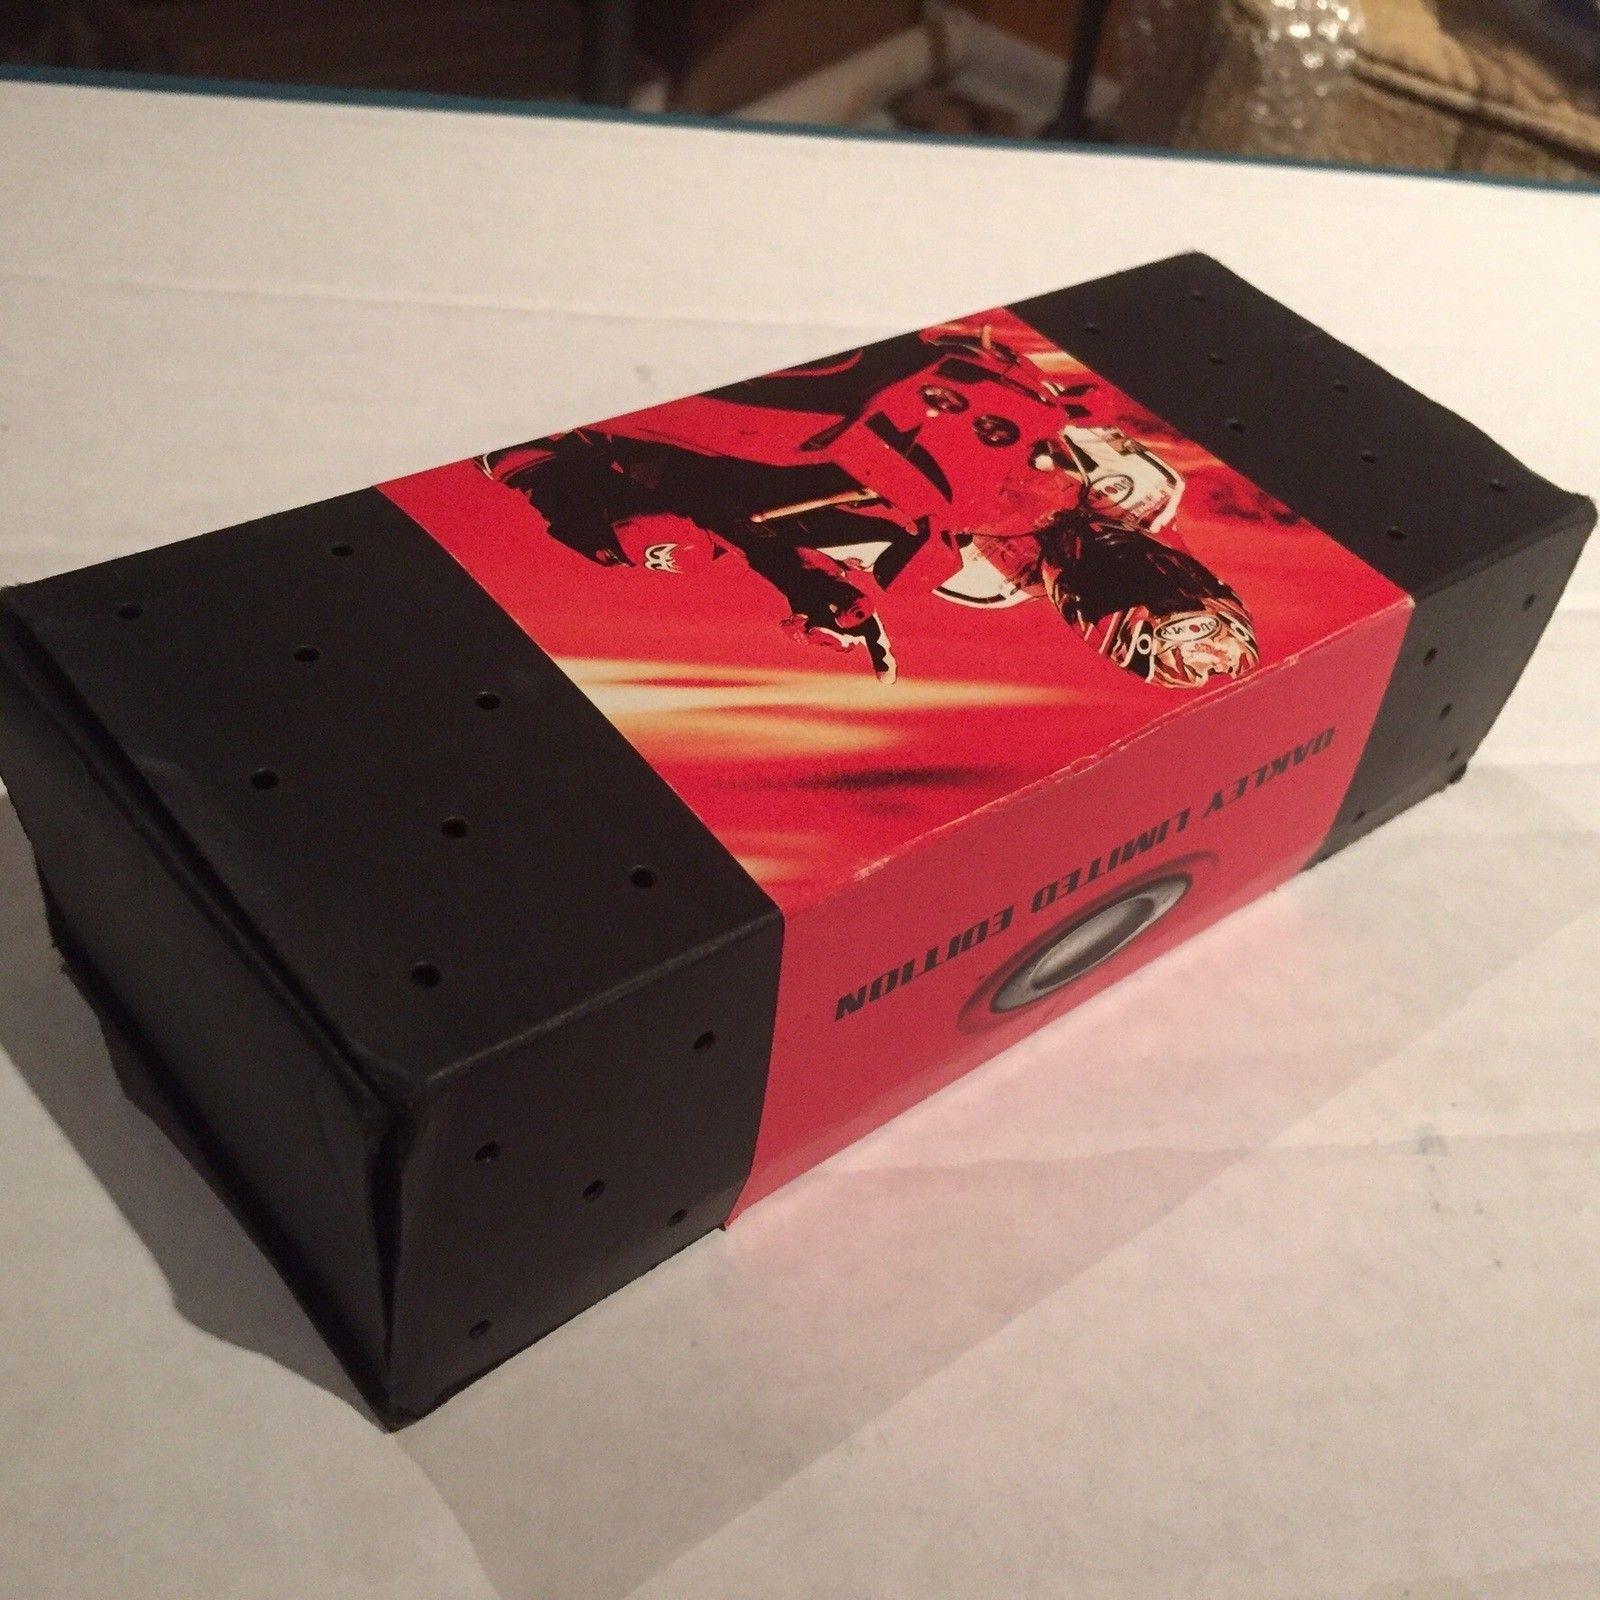 Juliet Ducati box, lenses, coin - image.jpg